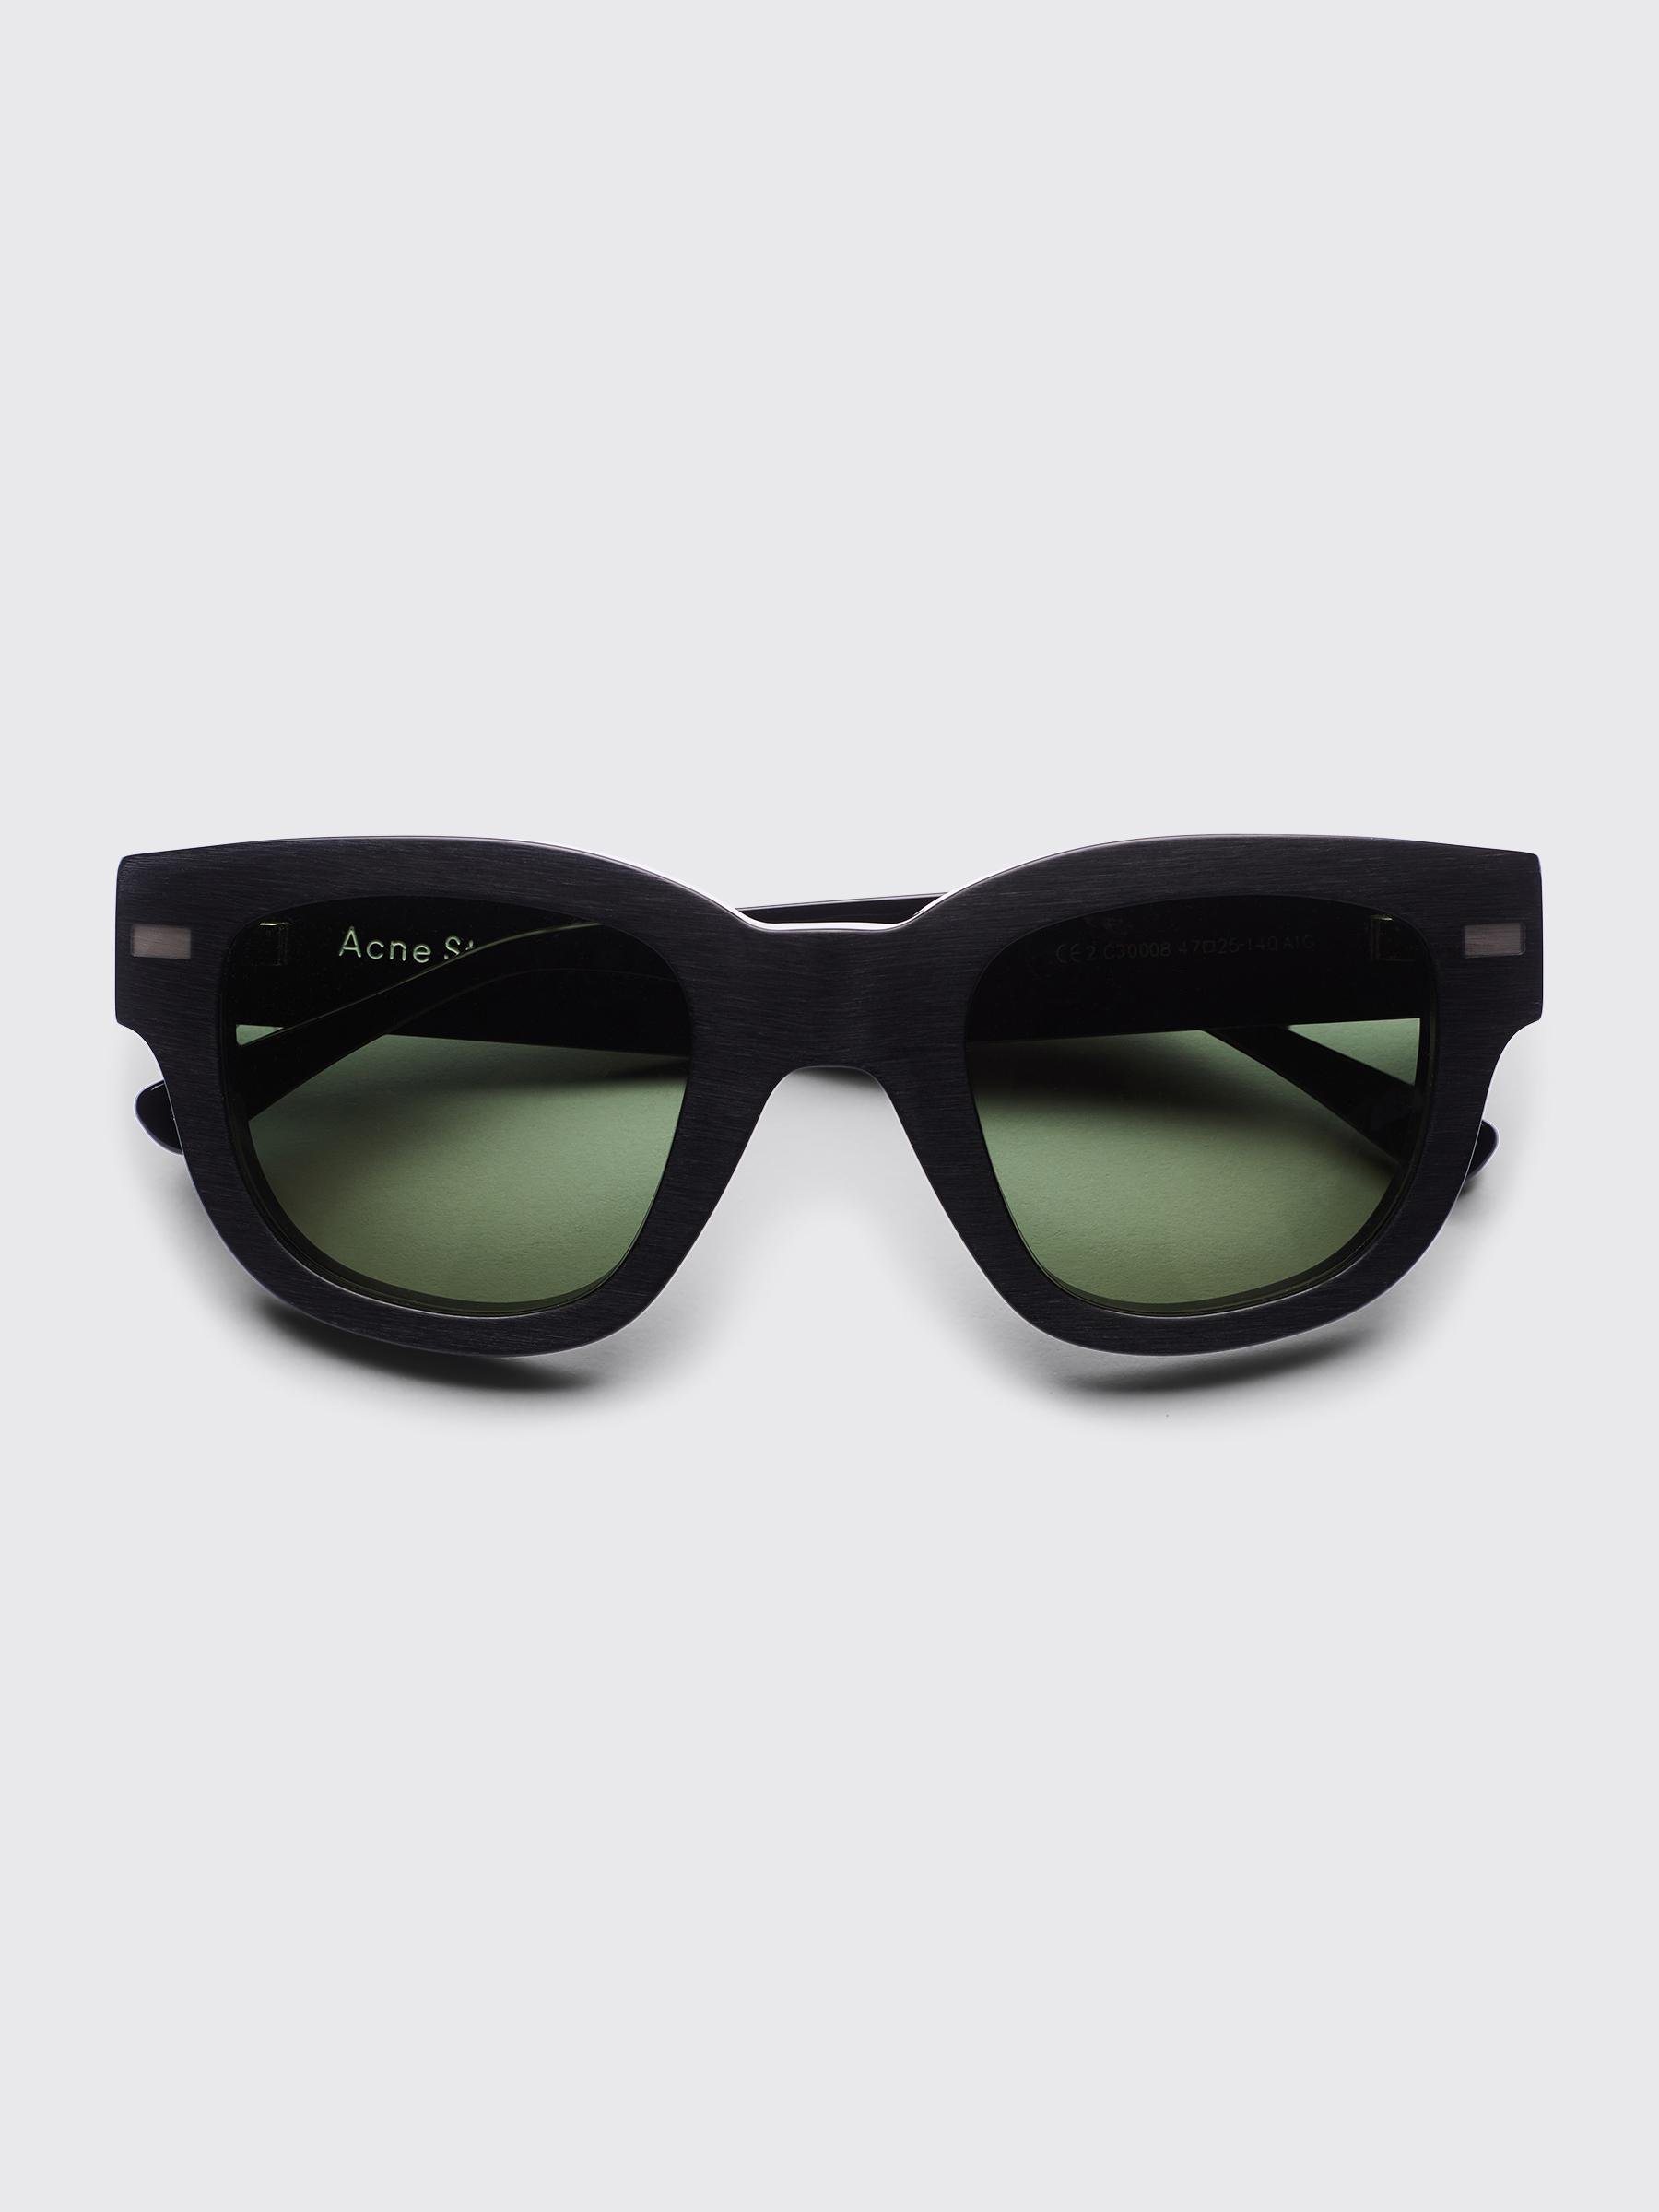 03a79f1506 Très Bien - Acne Studios Frame Sunglasses Black   Green